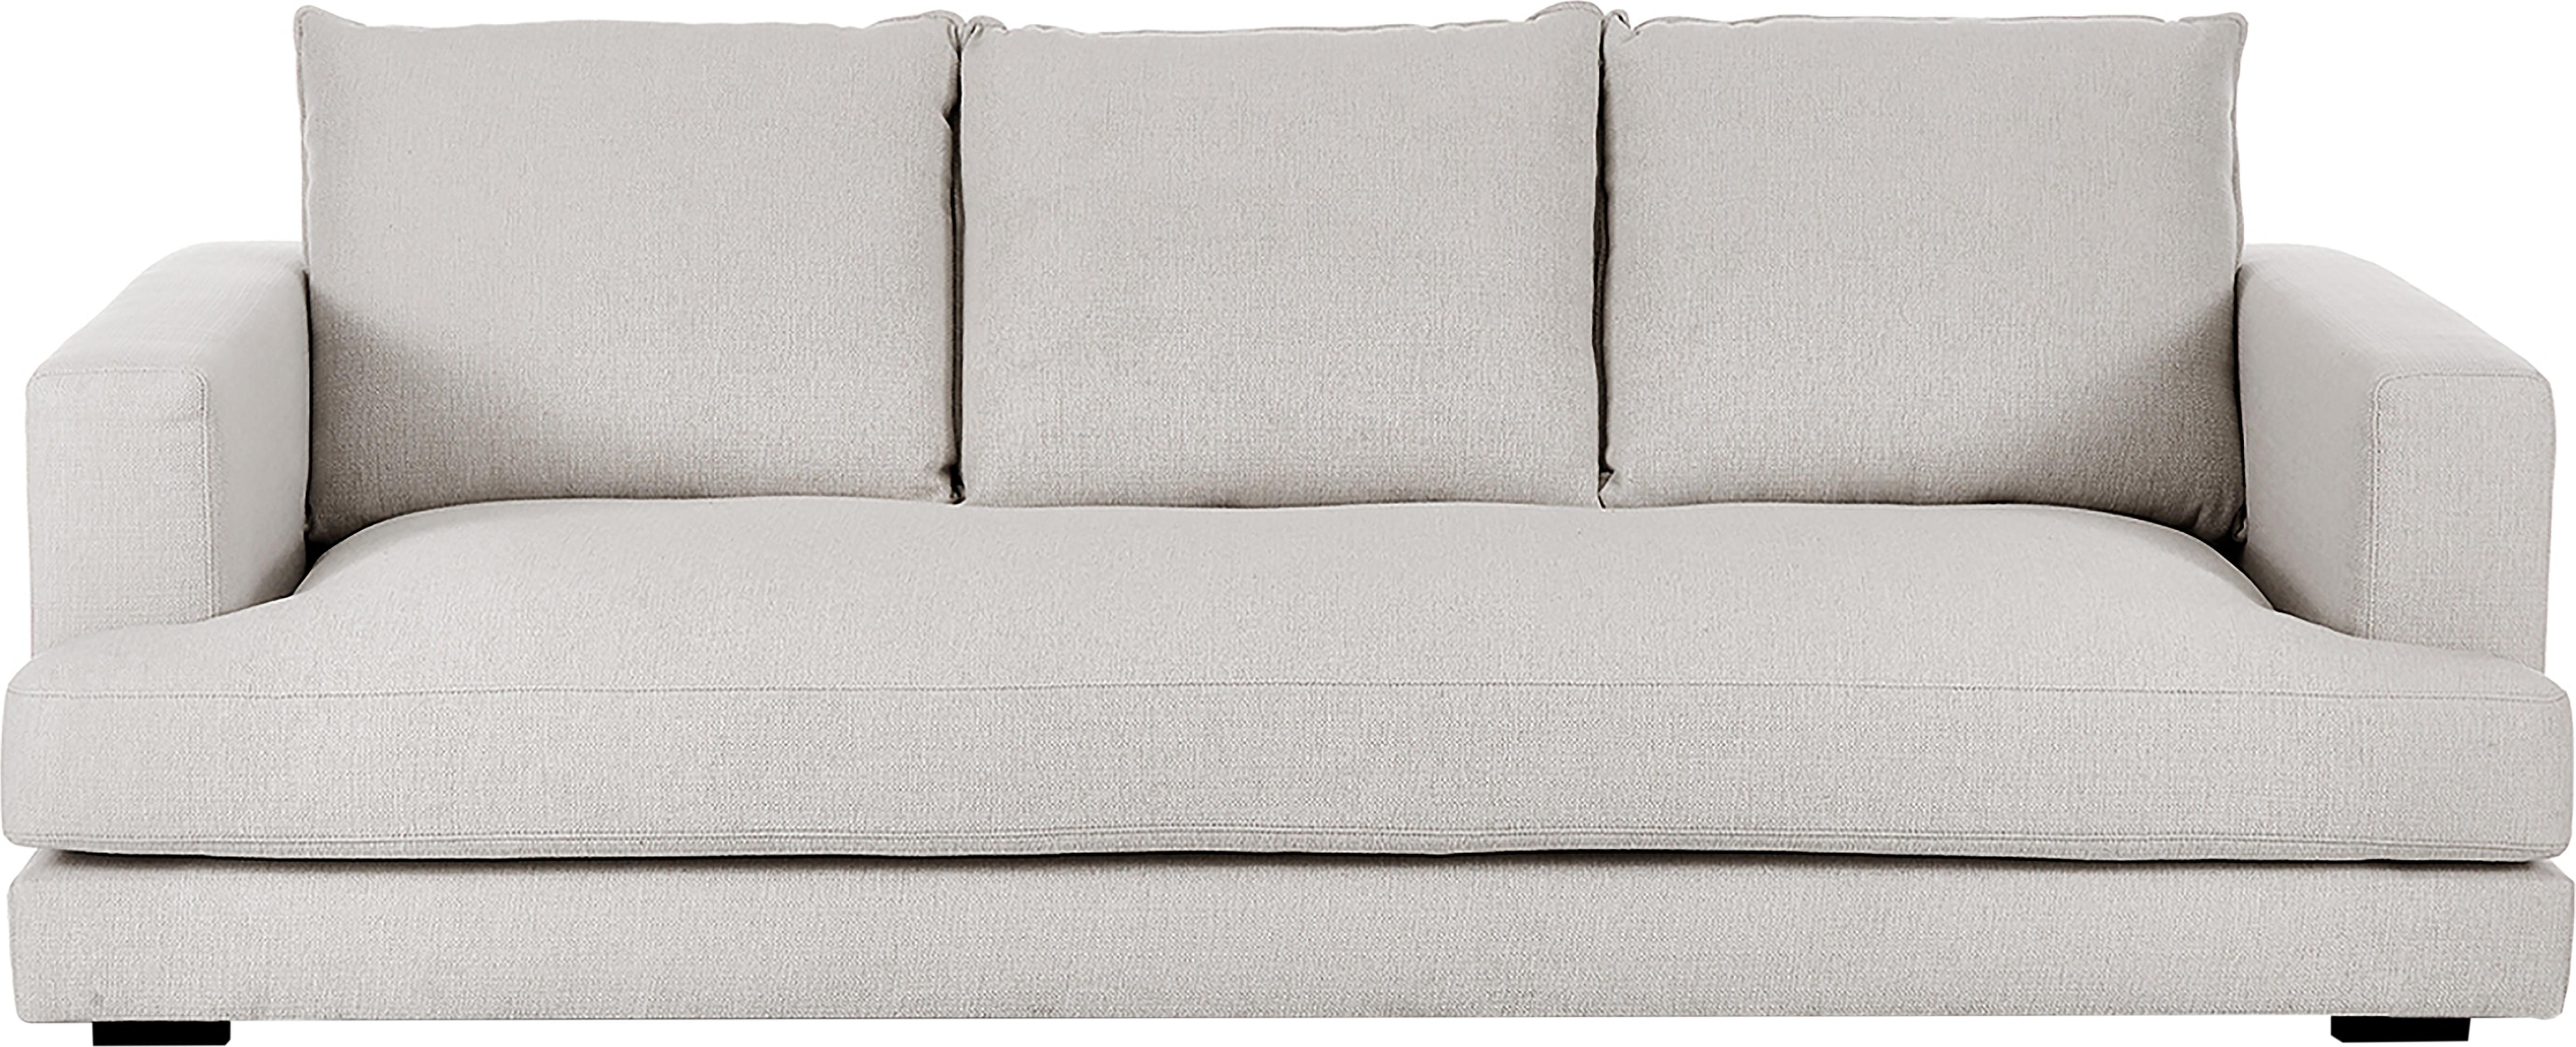 Sofa Tribeca (3-Sitzer), Bezug: Polyester 25.000 Scheuert, Sitzfläche: Schaumpolster, Fasermater, Gestell: Massives Kiefernholz, Füße: Massives Buchenholz, lack, Webstoff Beigegrau, B 228 x T 104 cm